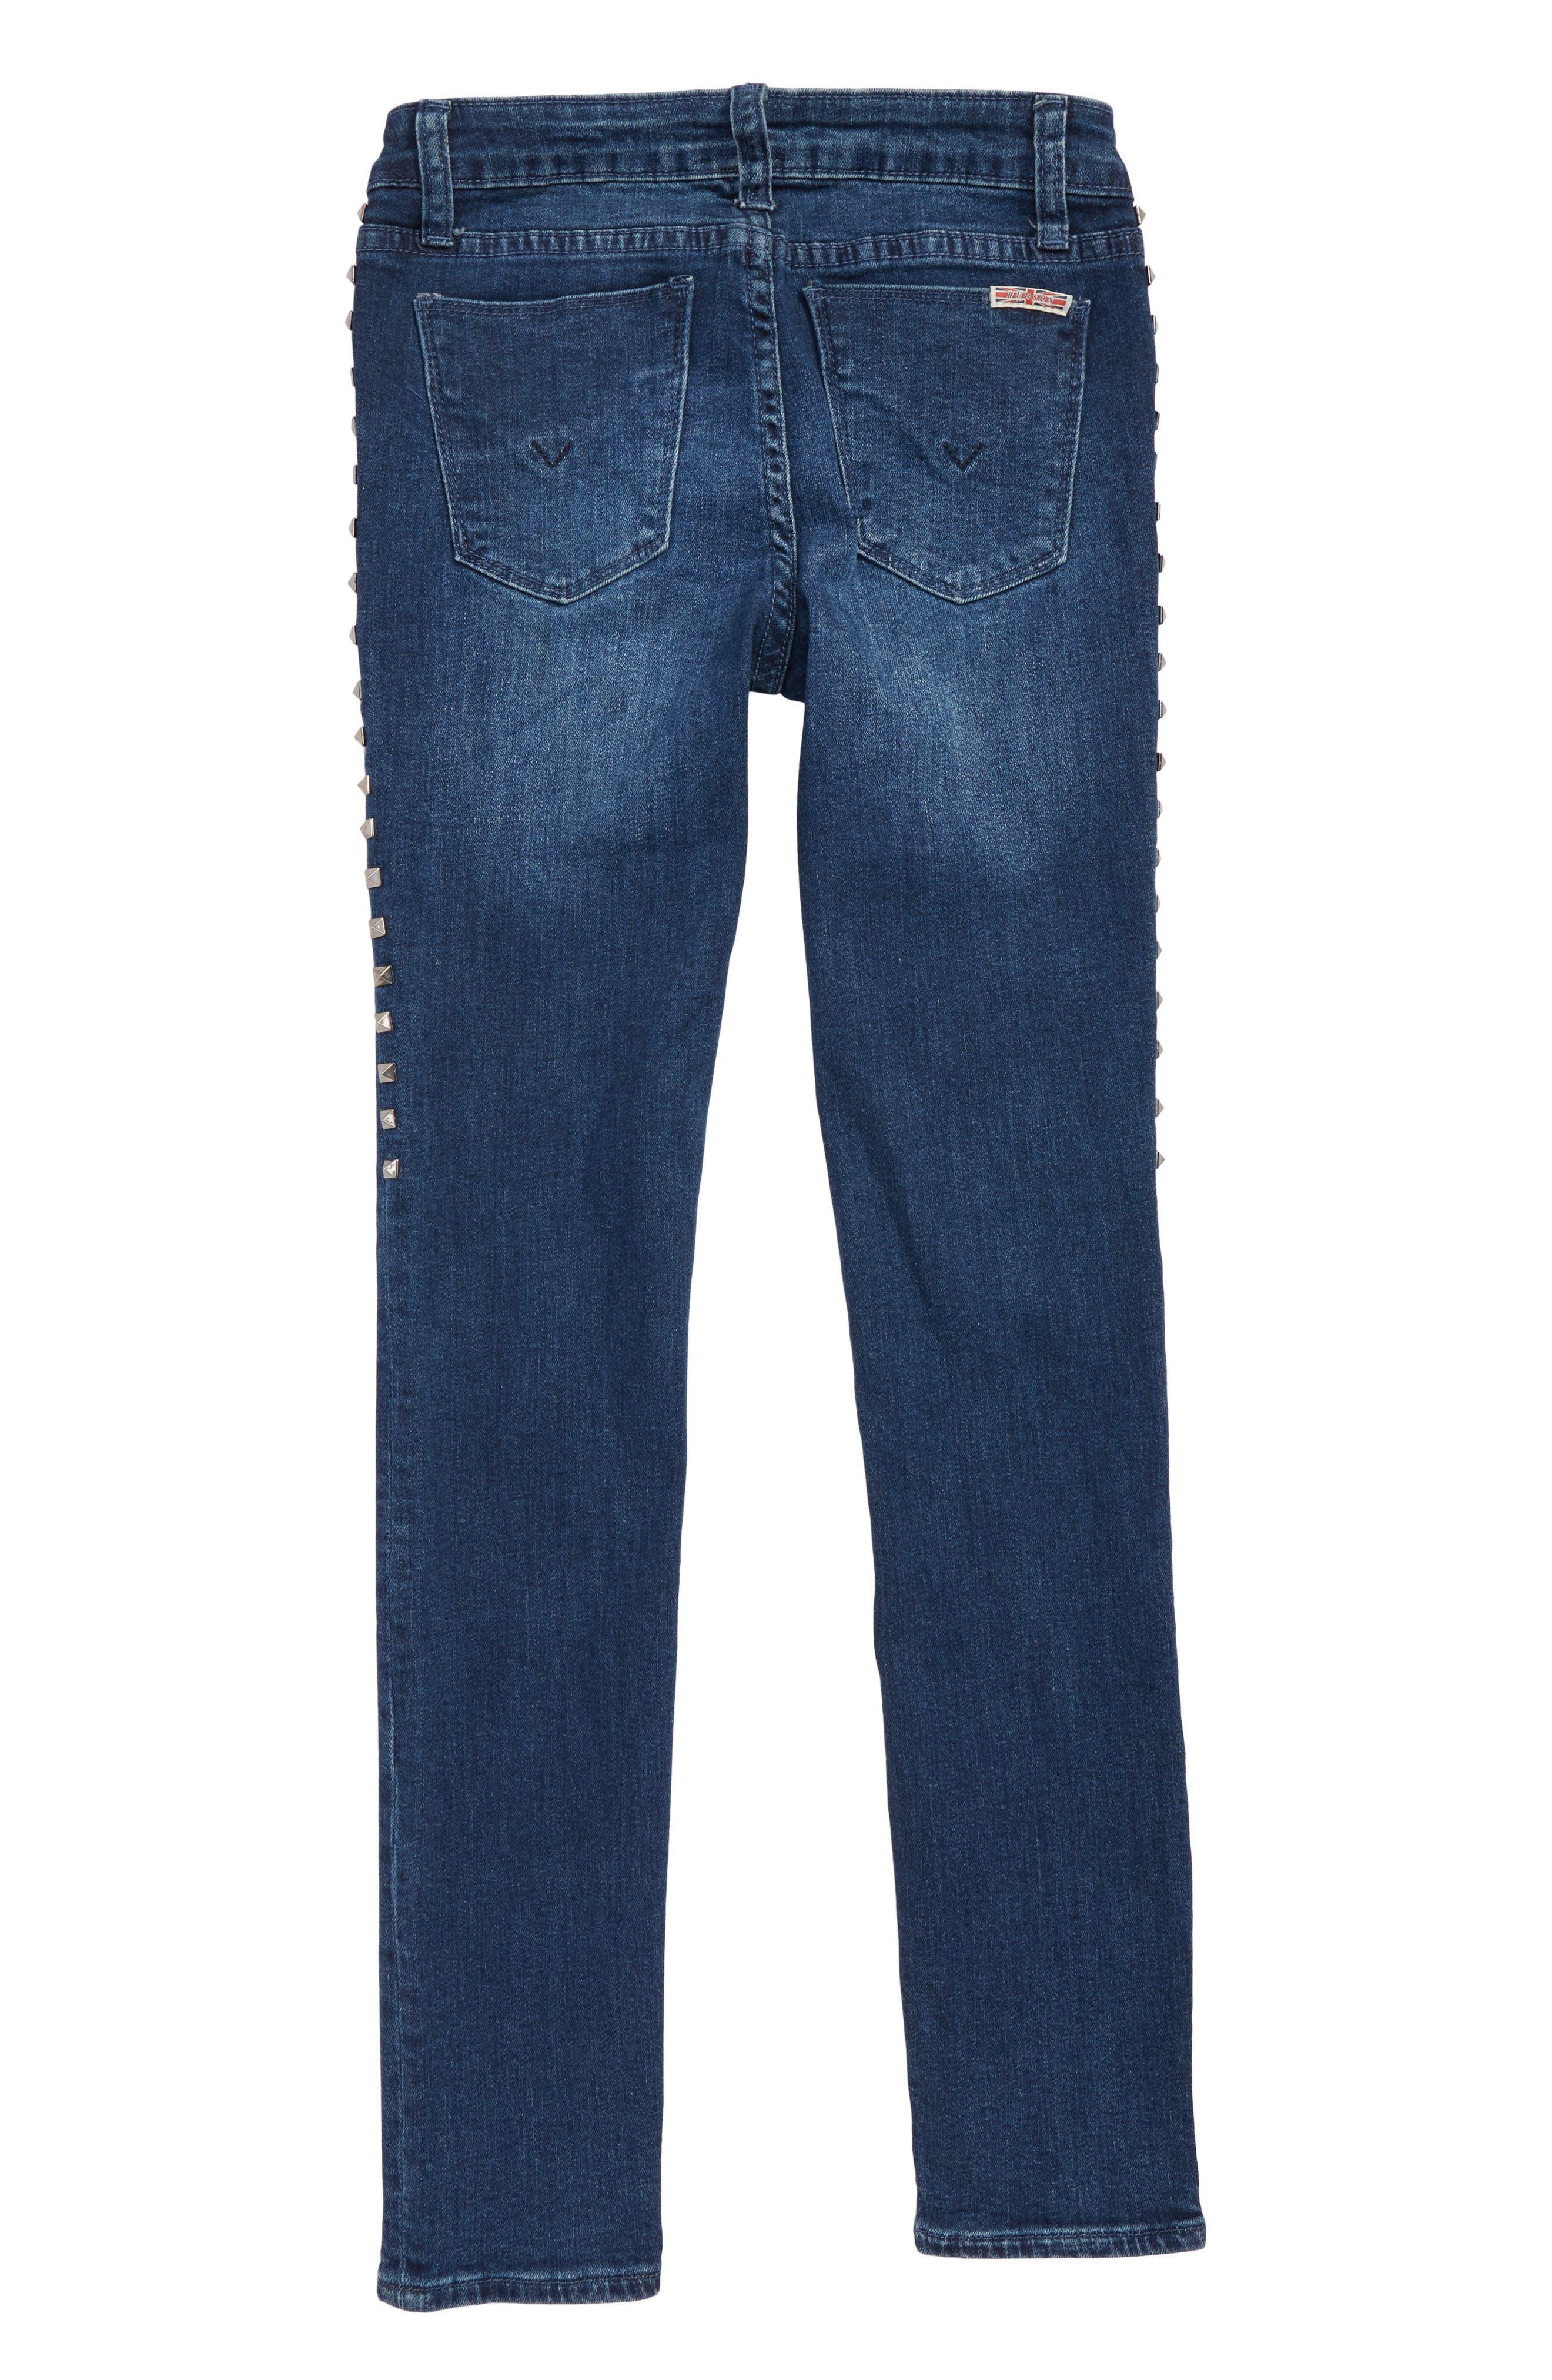 Studded Skinny Jeans,                             Alternate thumbnail 2, color,                             400